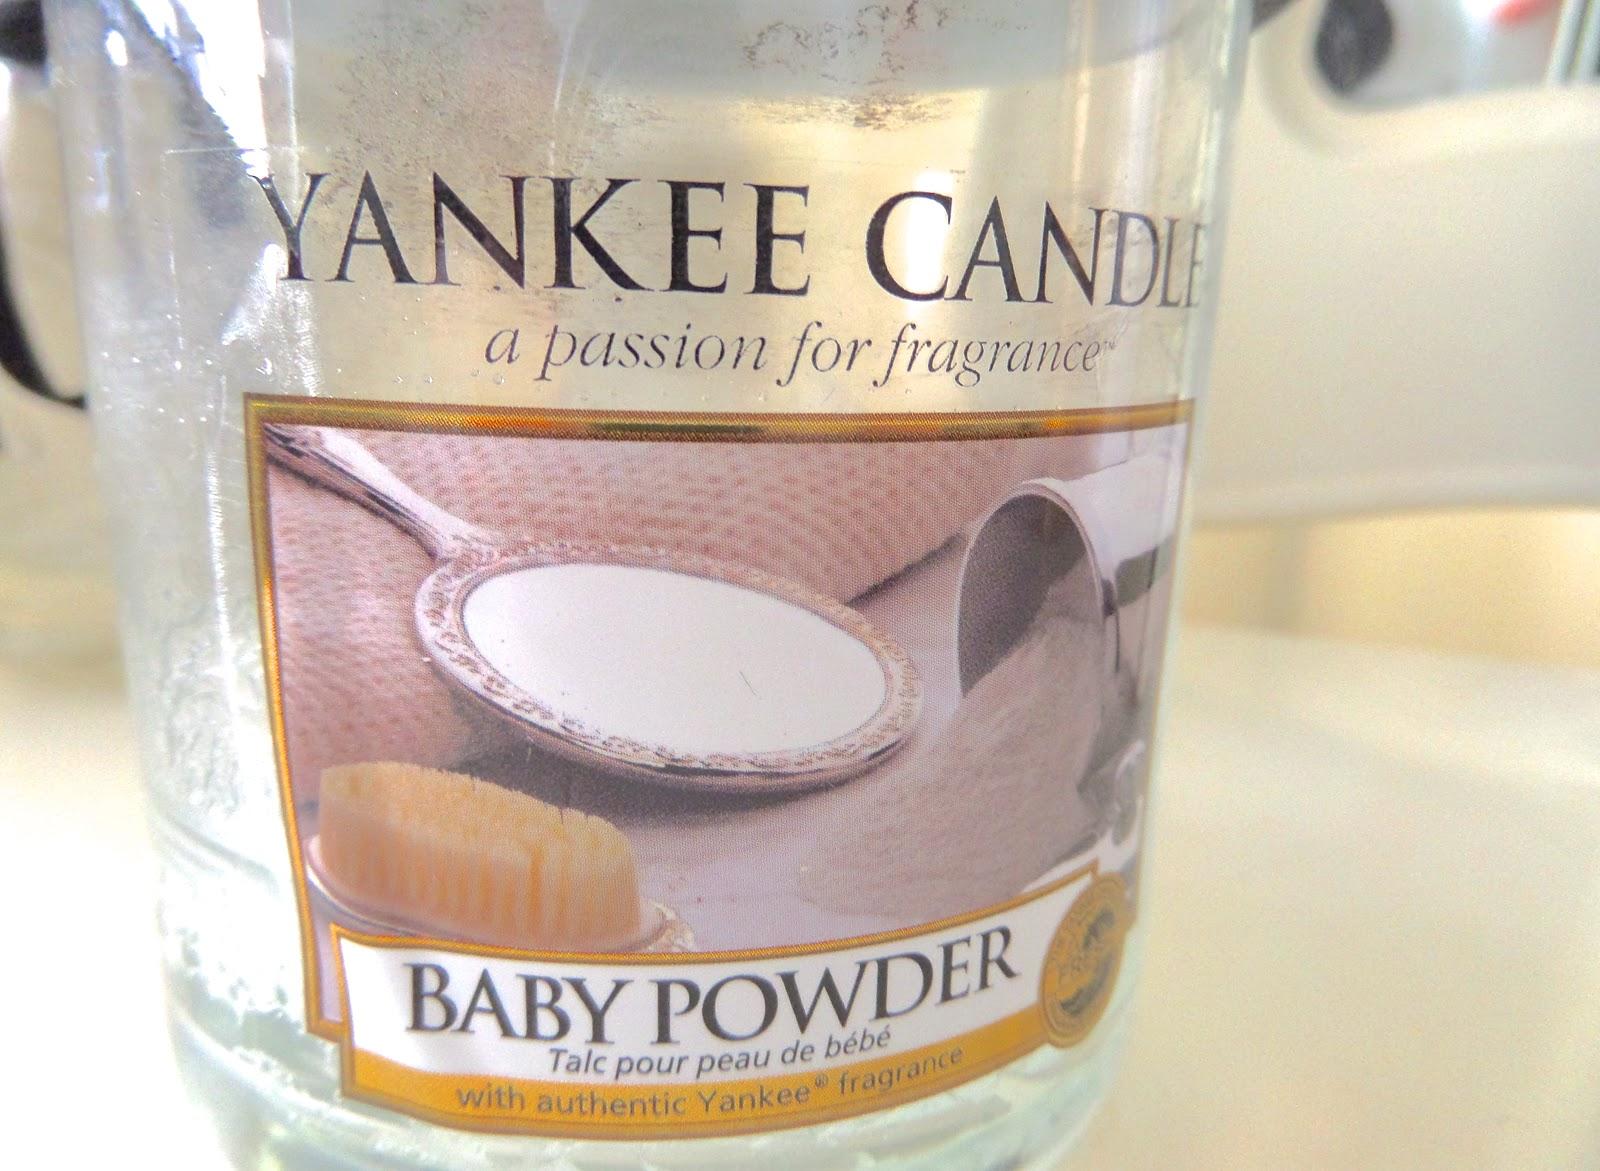 Yankee Candle Baby Powder